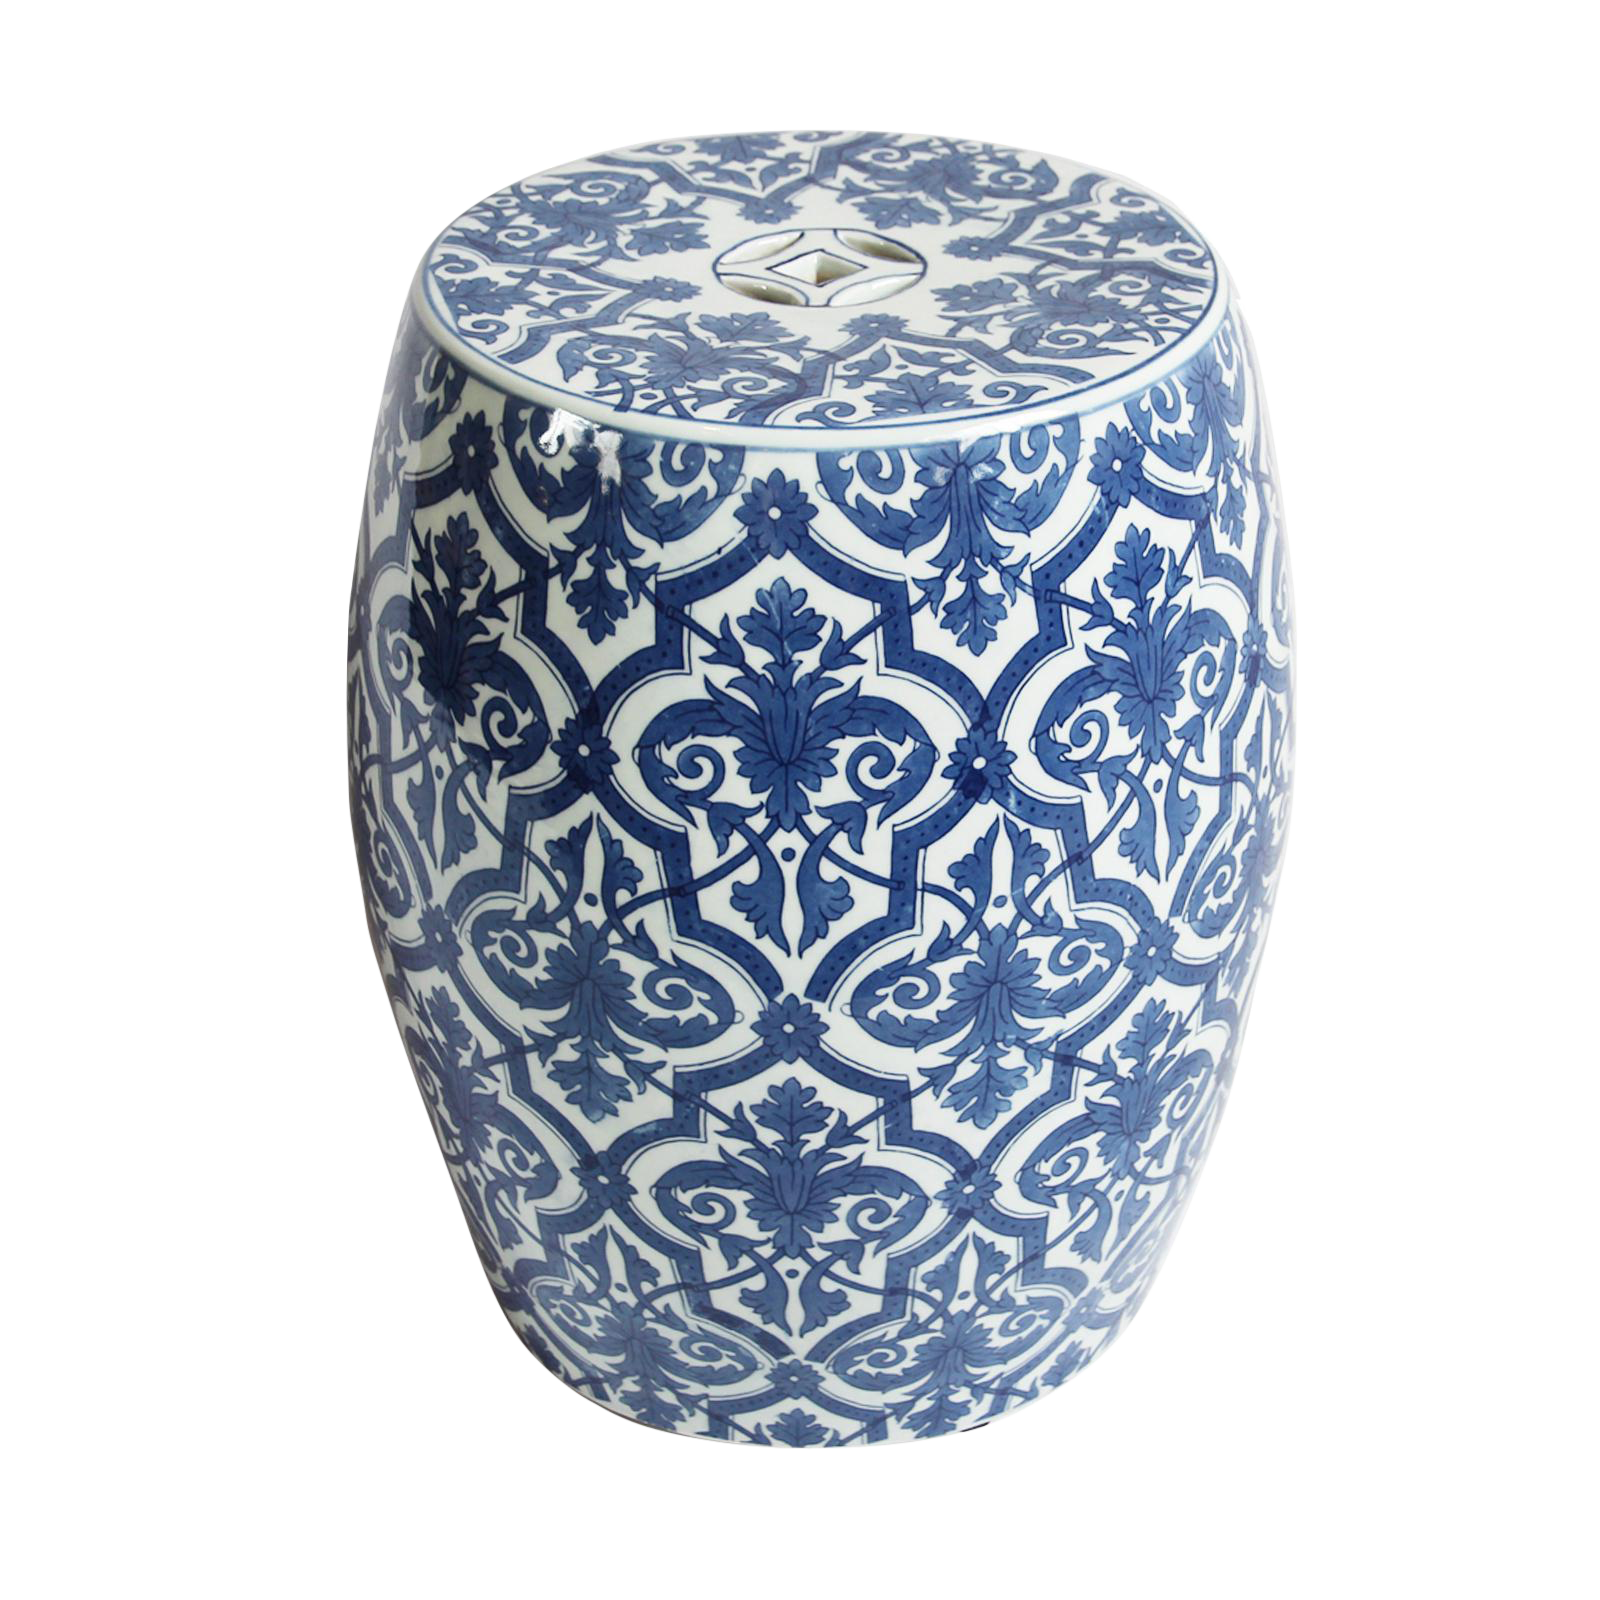 Blue u0026 White Ceramic Garden Stool  sc 1 st  Chairish & Vintage u0026 Used Chinese Garden Stools | Chairish islam-shia.org